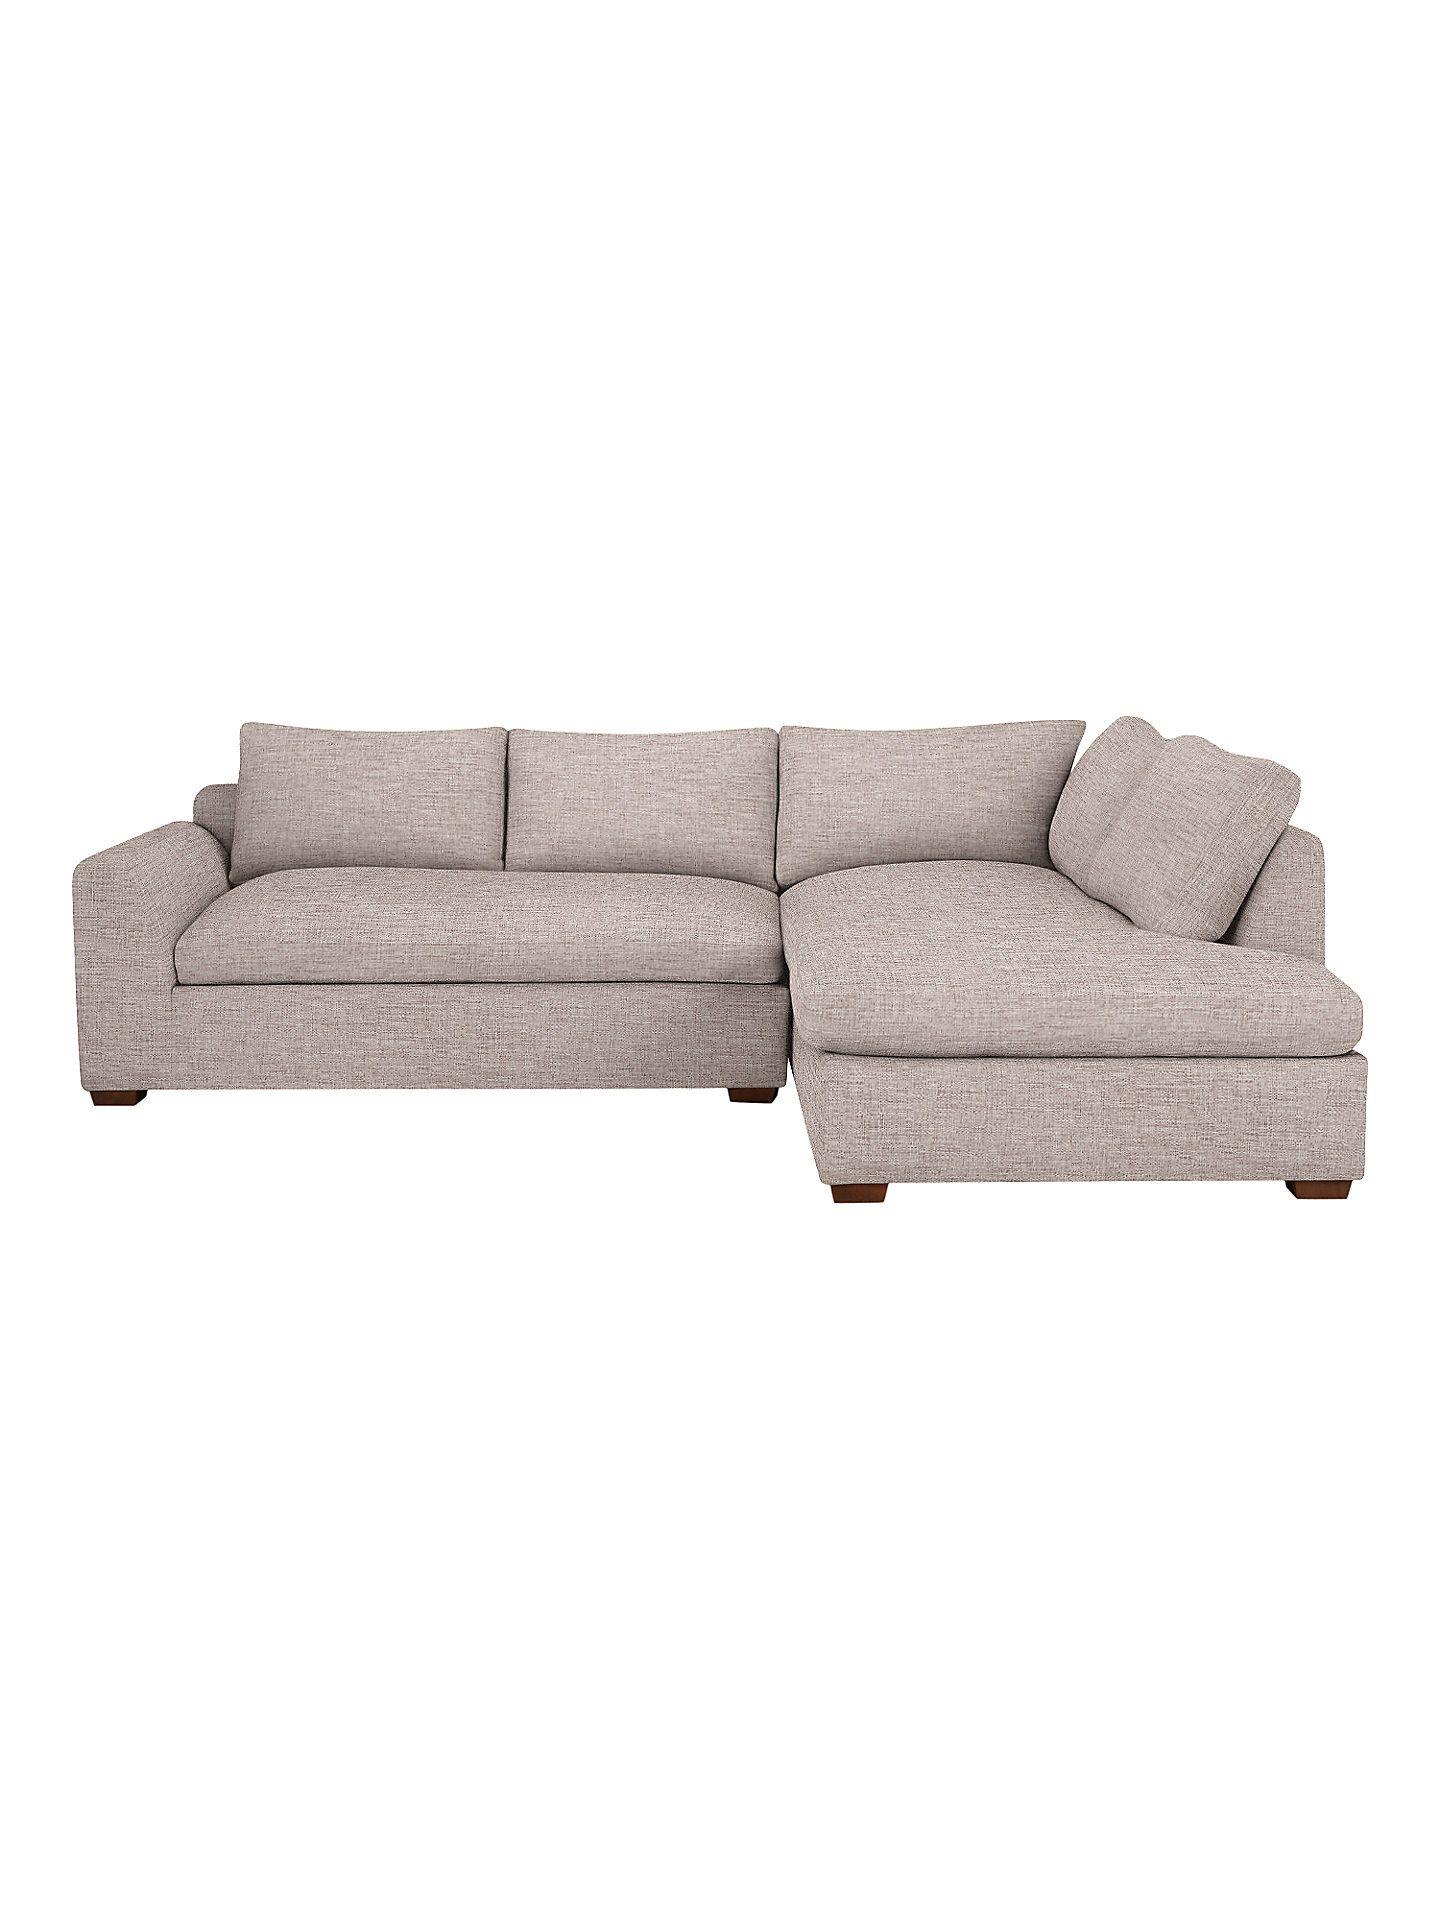 John Lewis & Partners Tortona RHF Chaise End Sofa, Aquaclean ...